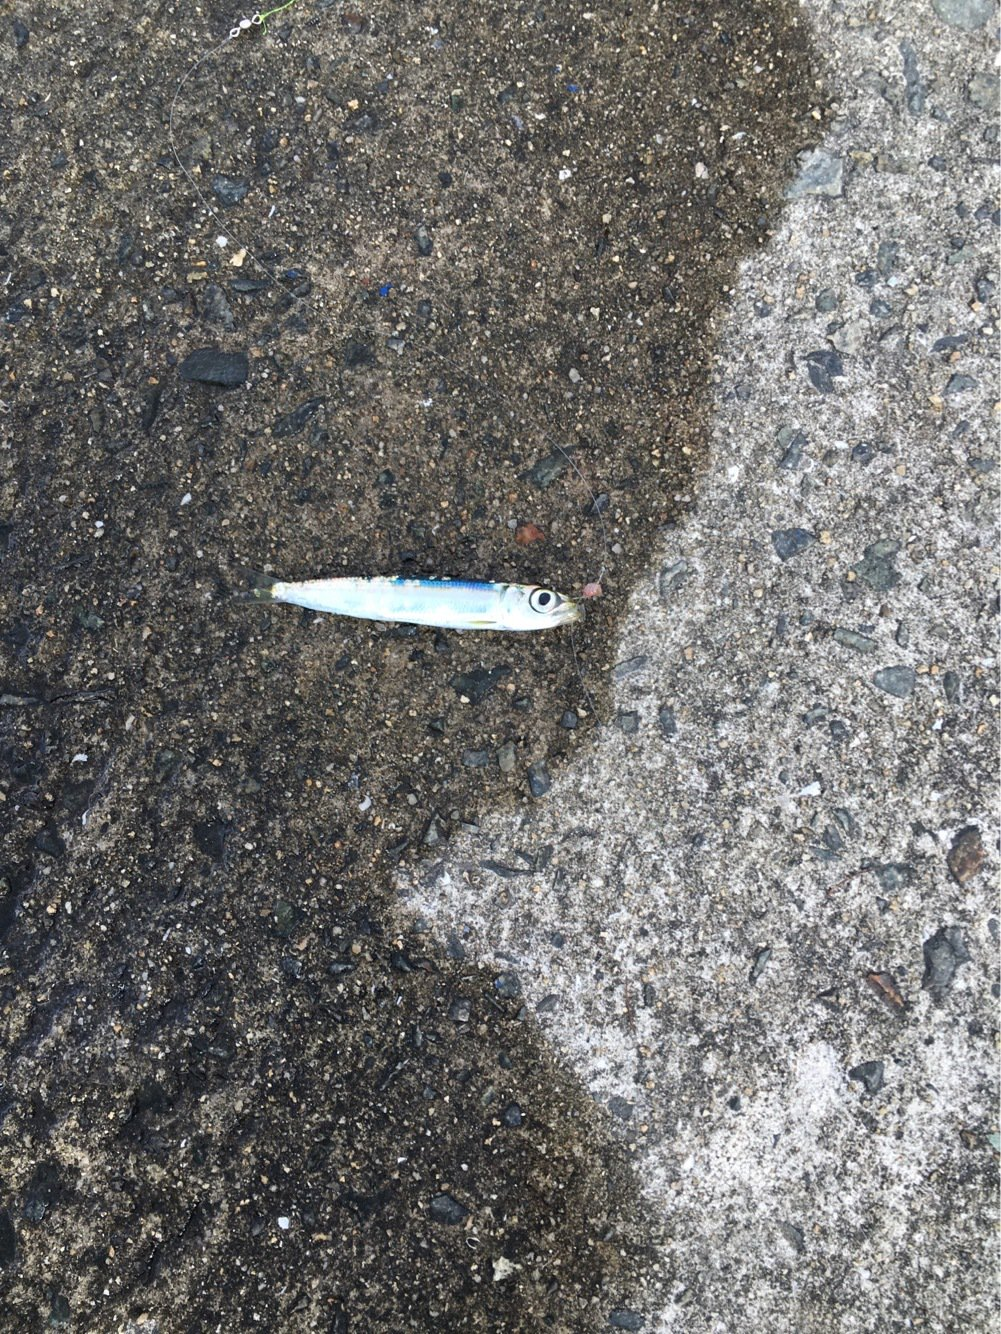 skyさんの投稿画像,写っている魚はカタクチイワシ